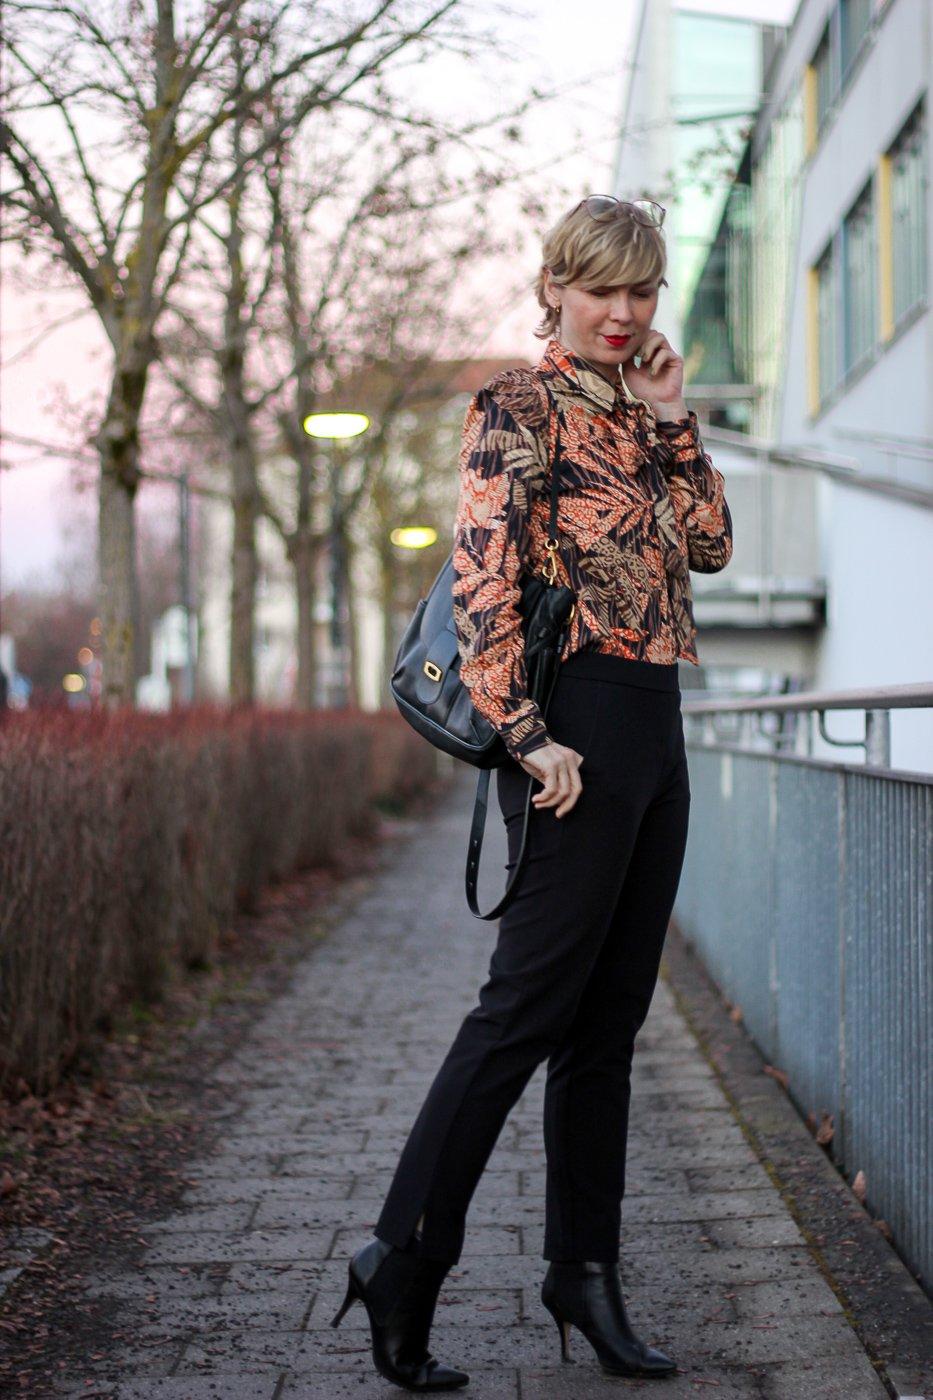 conny doll lifestyle: Frühjahrsmode von TONI-Fashion, Schluppenbluse, schwarze Hose elegant, Officelook